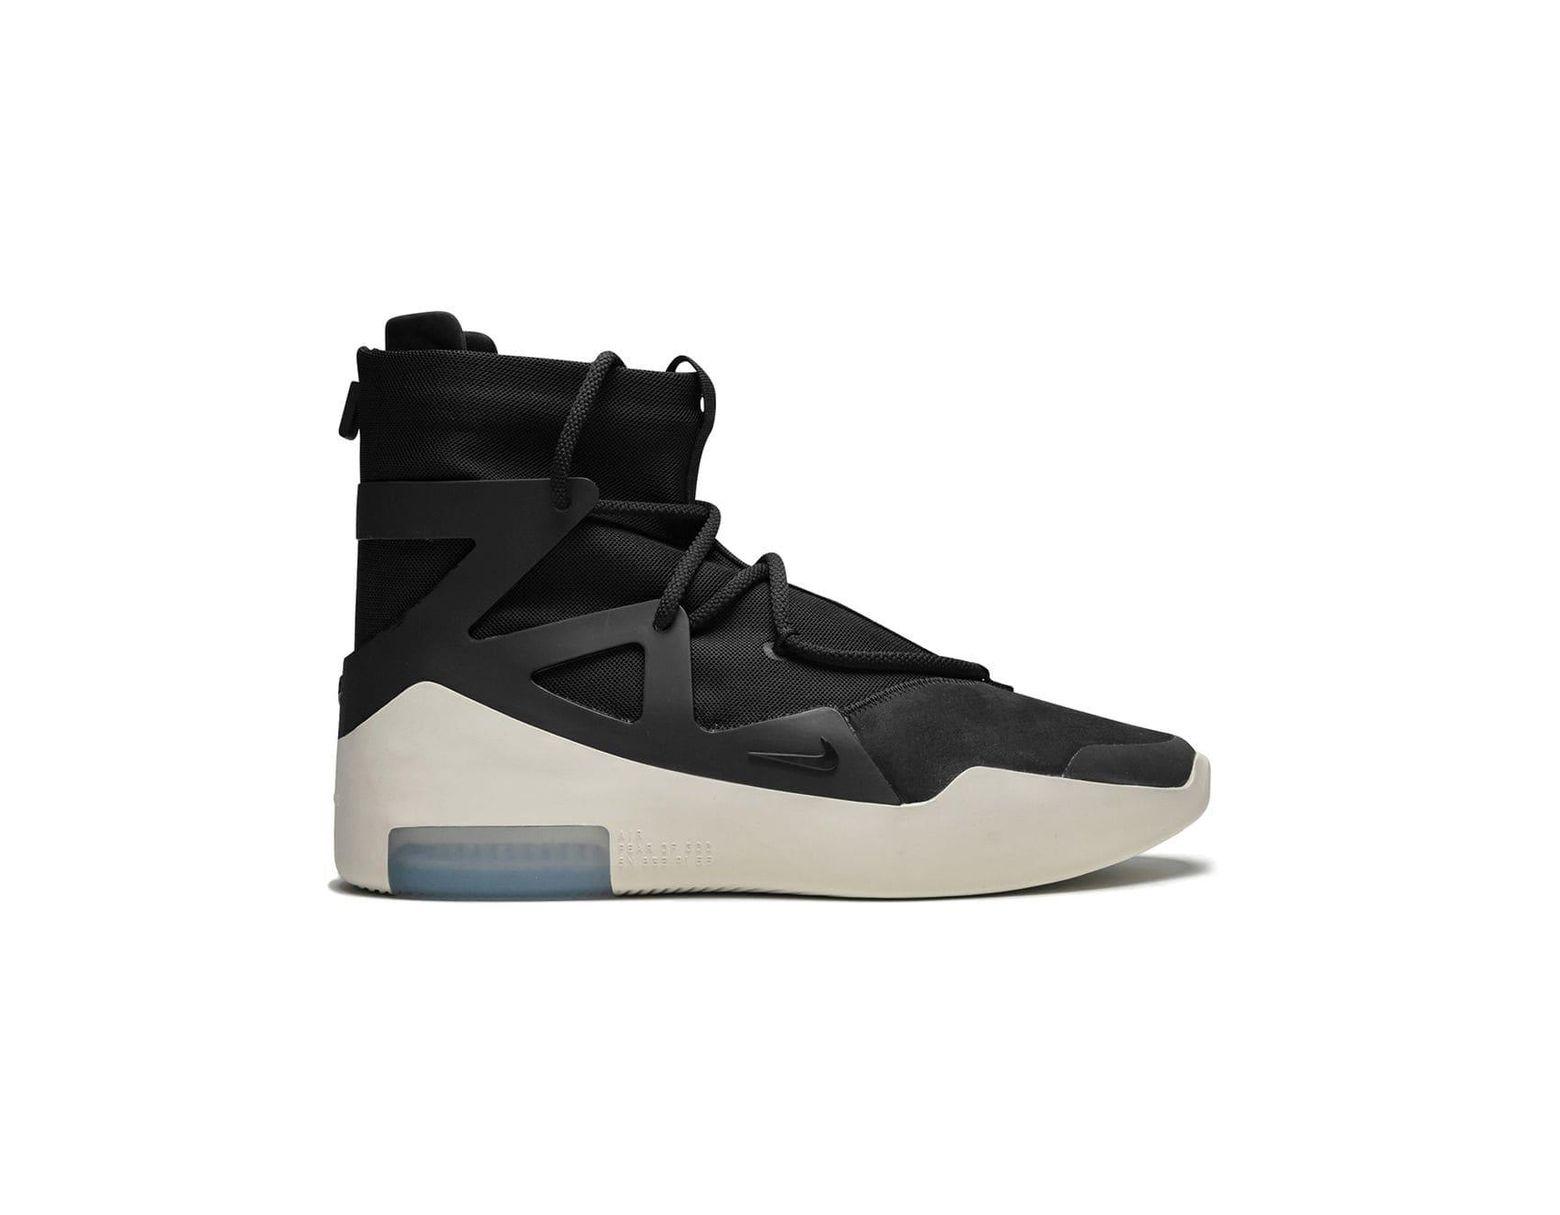 ff3ab58b Nike Air Fear Of God 1 Hi-top Sneakers in Black for Men - Lyst